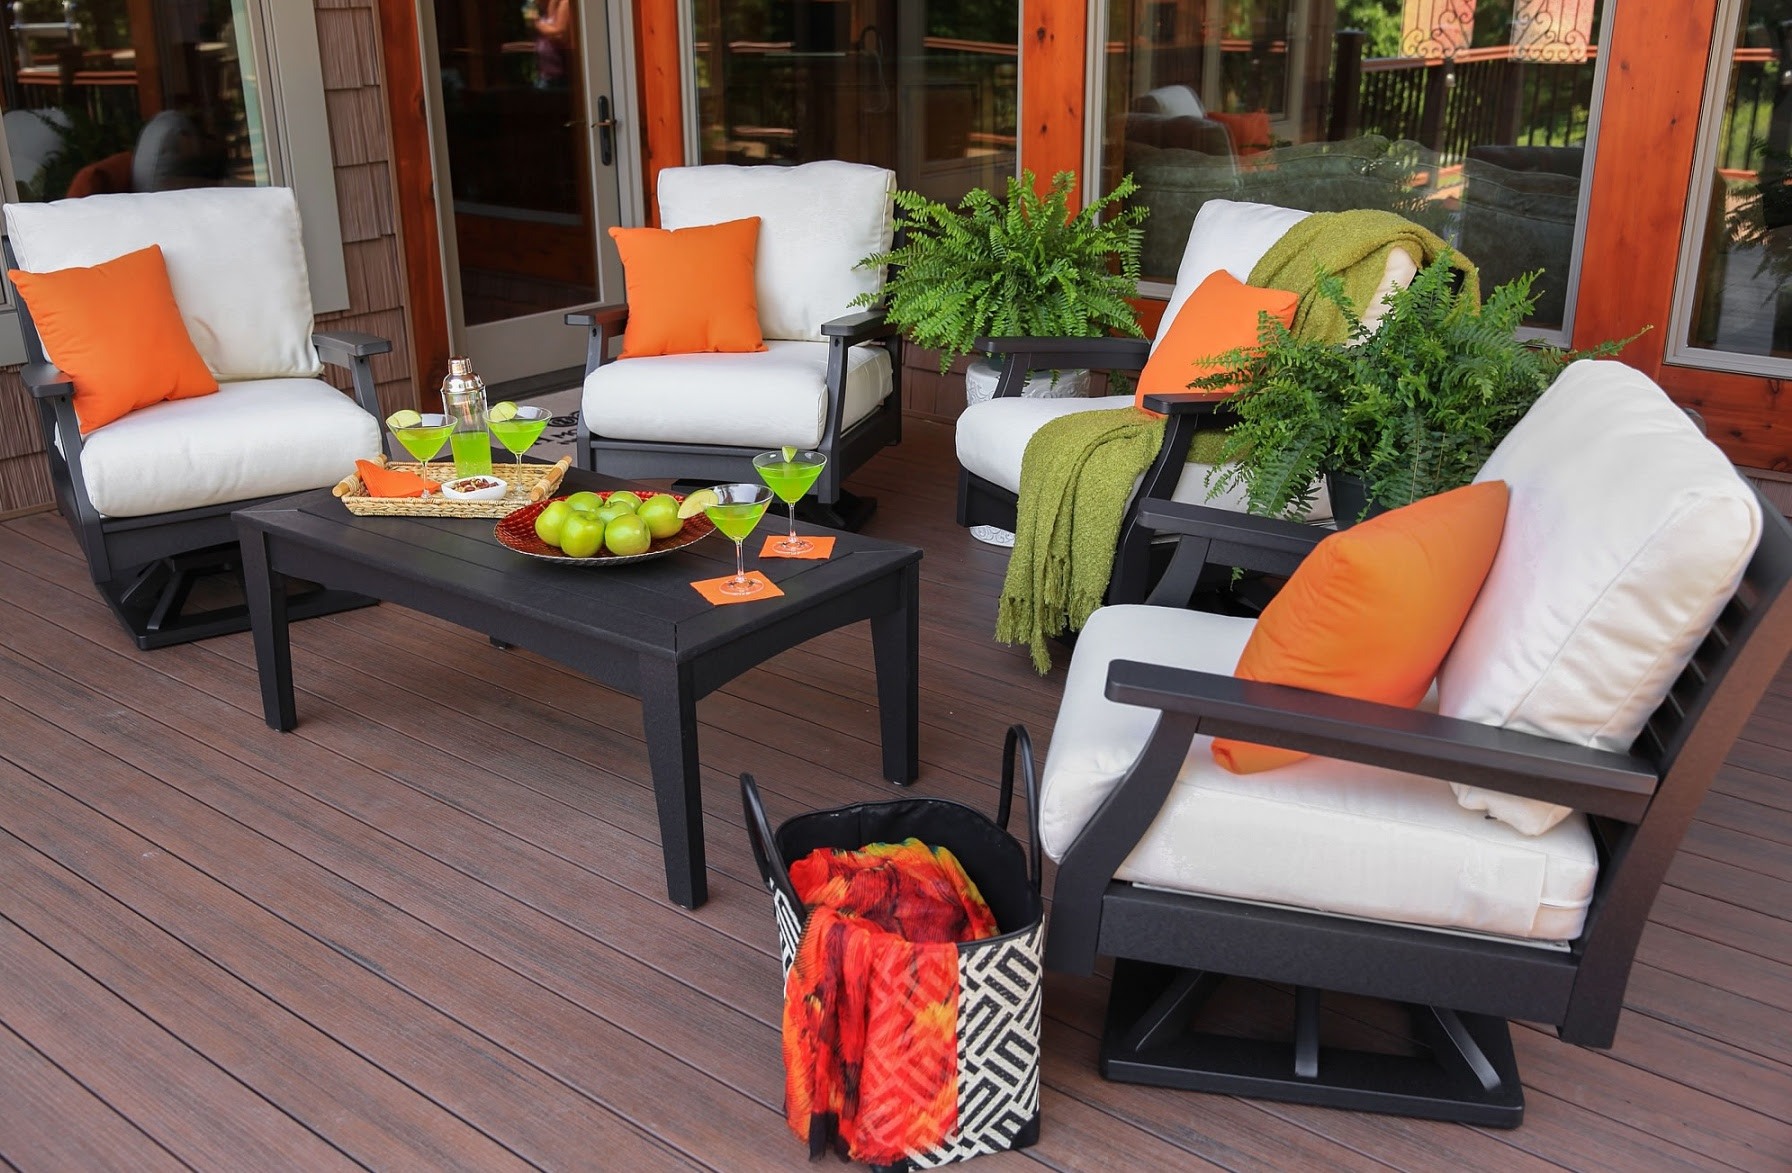 Art Van Outdoor Furniture for Perfect Patio Furnitures ...